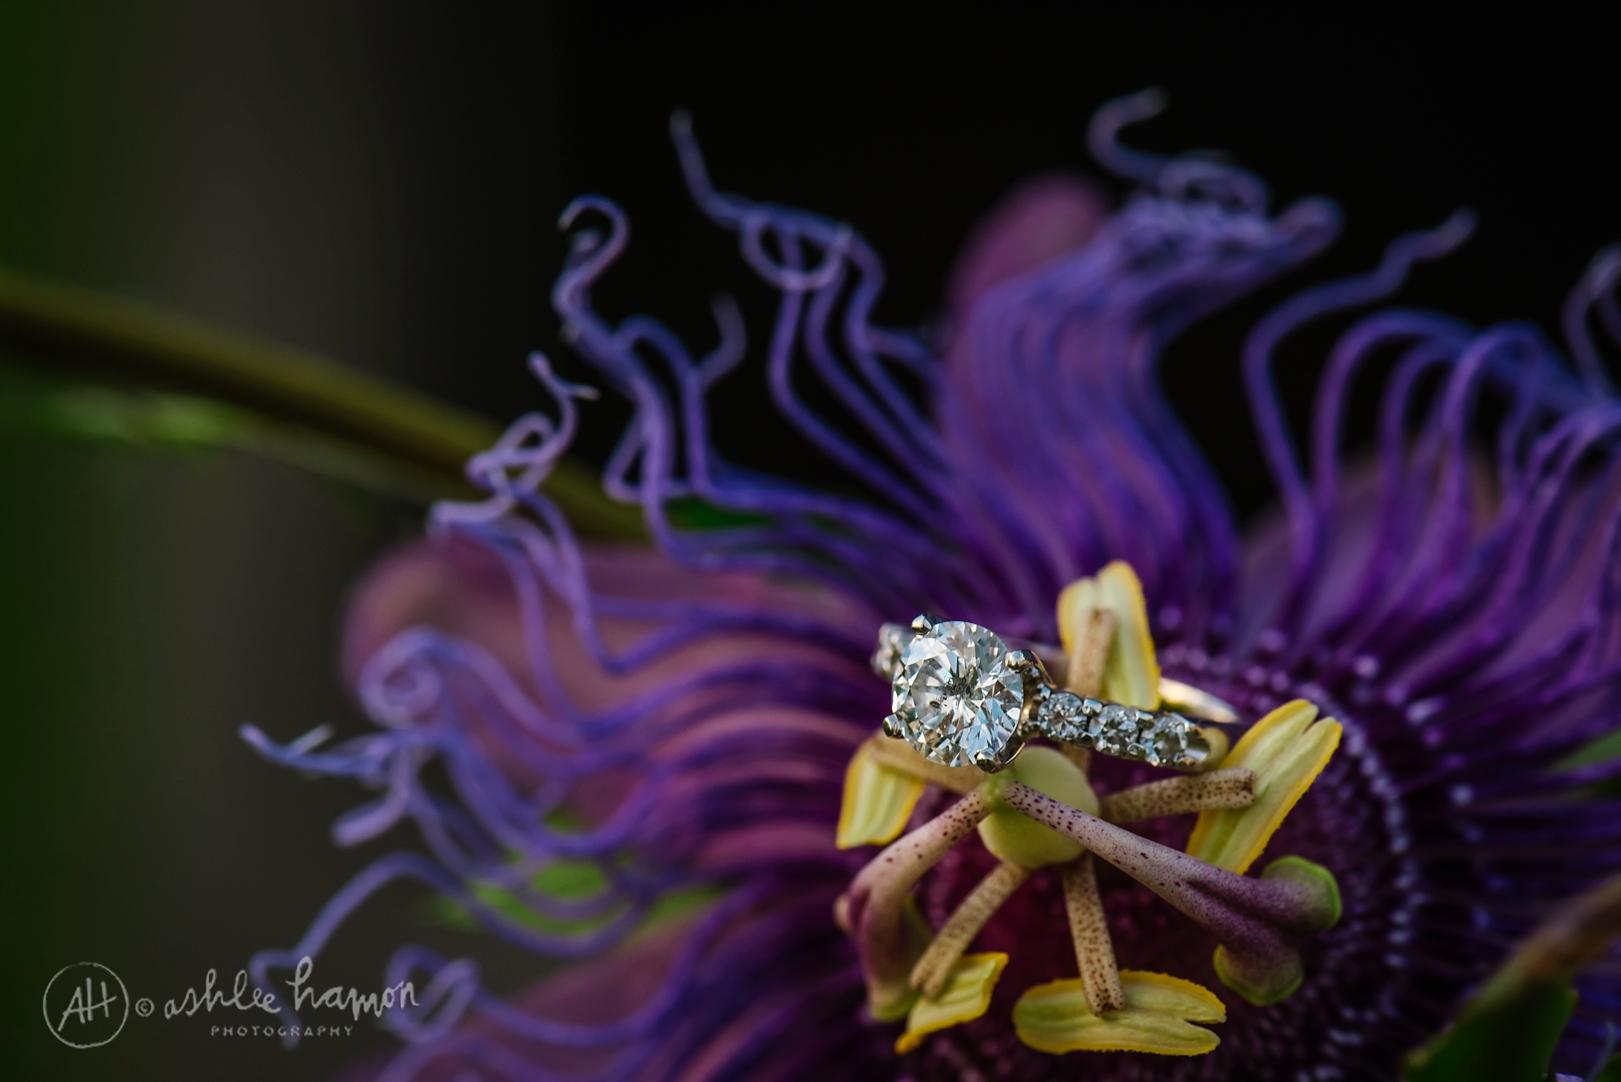 tampa-engagement-photographer-ashlee-hamon_0010.jpg